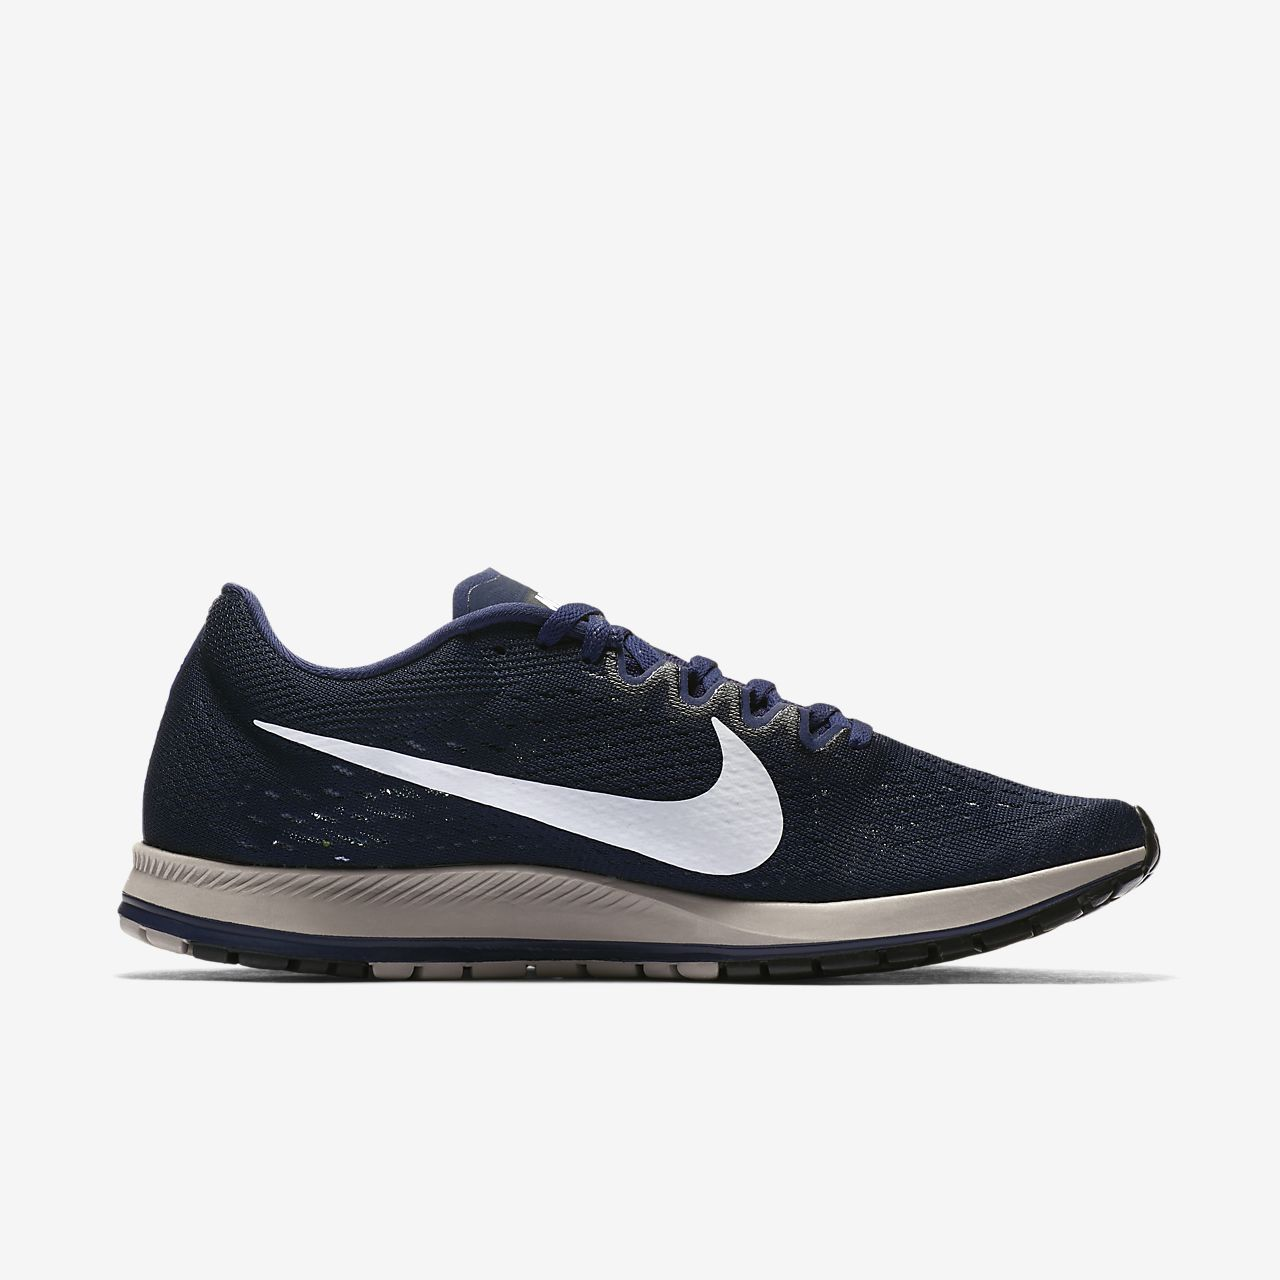 ... Nike Zoom Streak 6 Unisex Racing Shoe